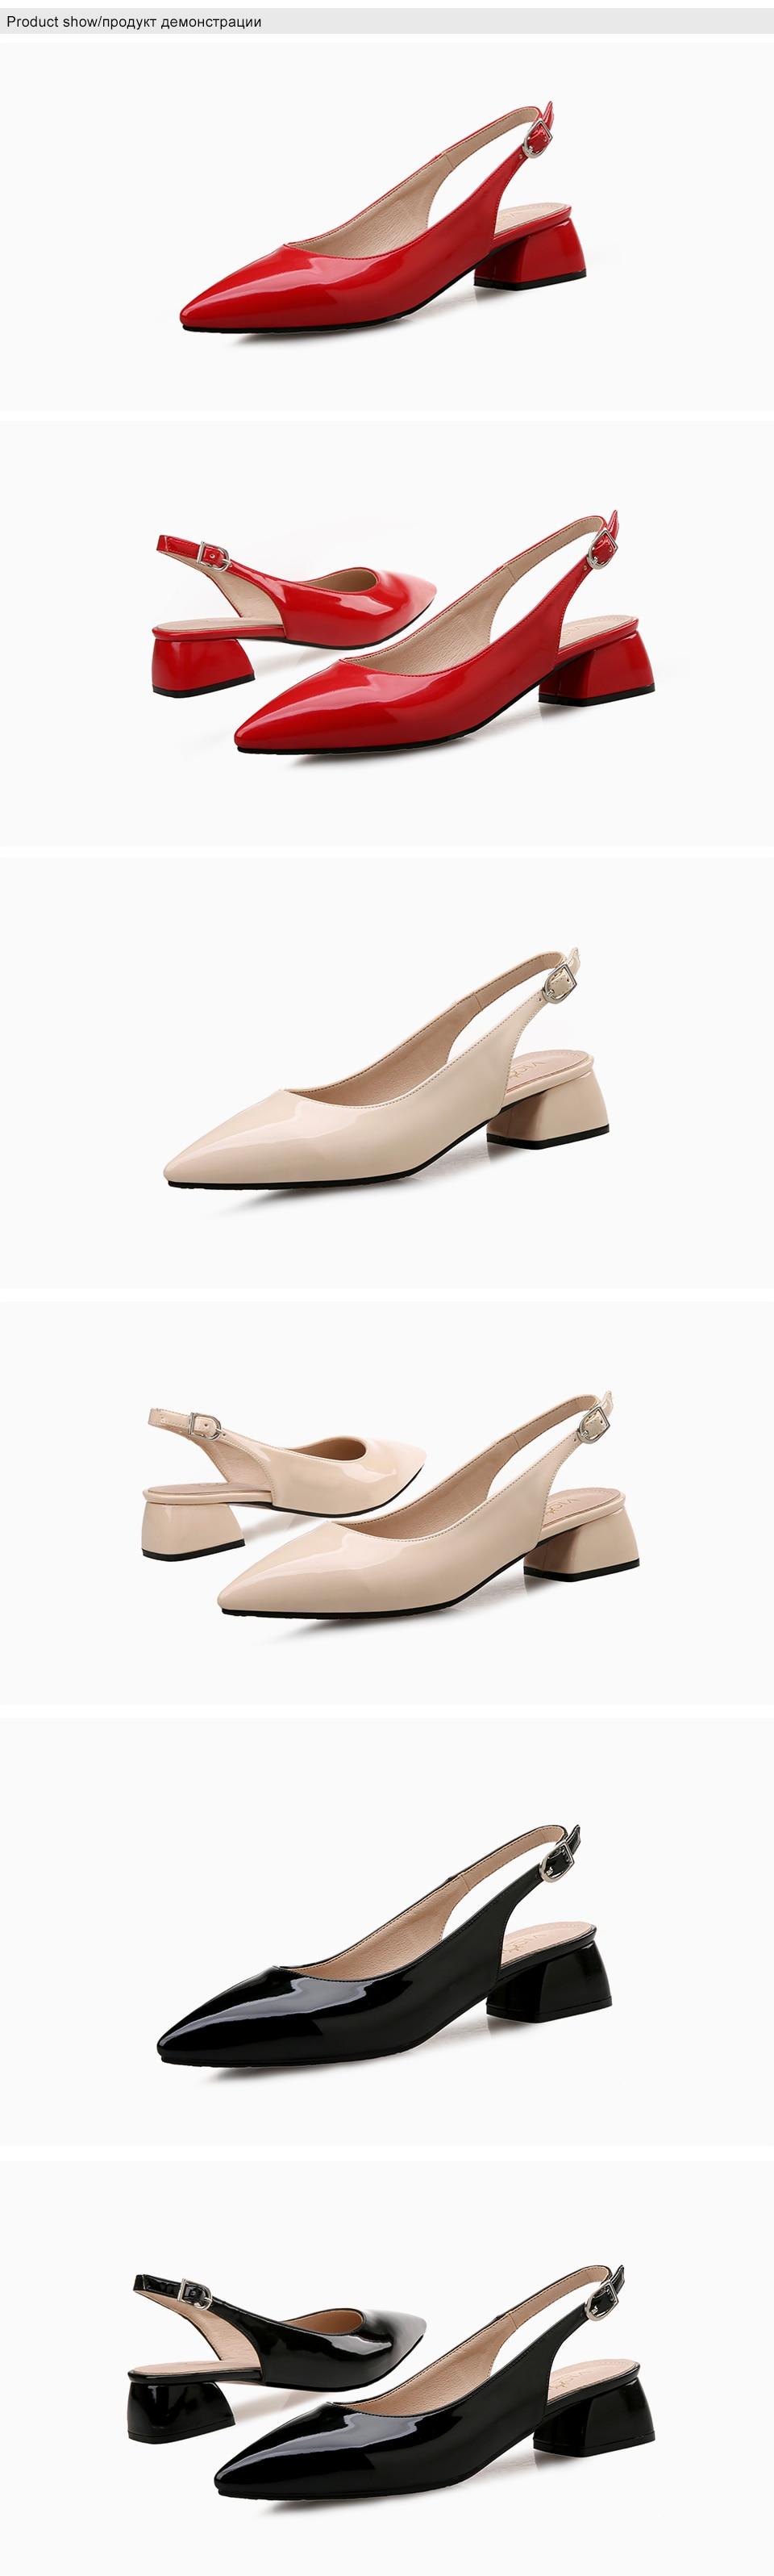 3 women high heels